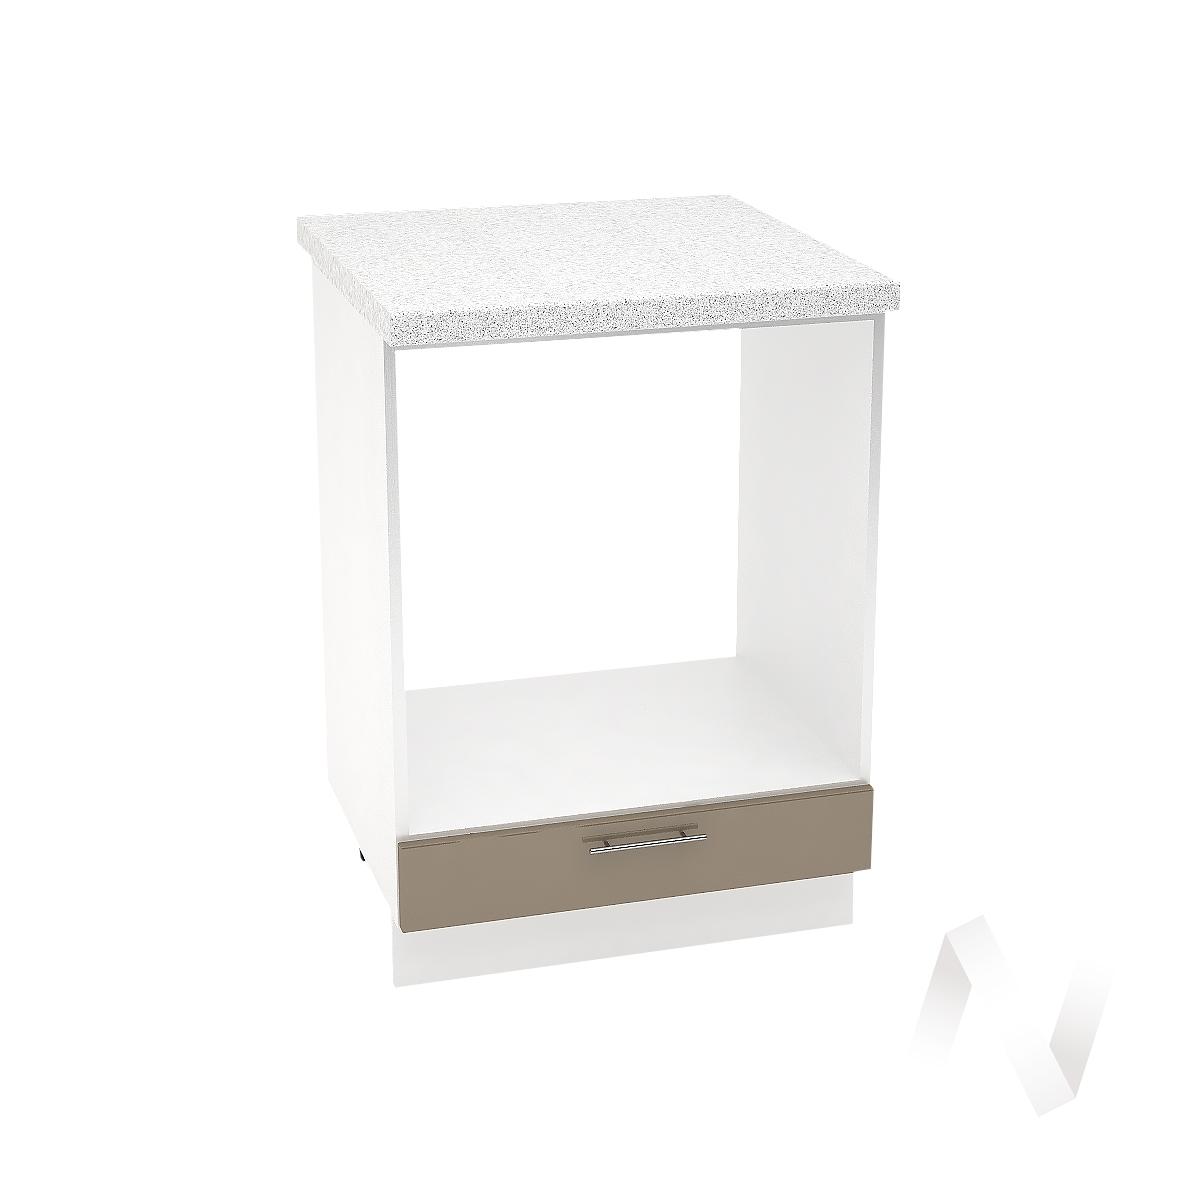 "Кухня ""Валерия-М"": Шкаф нижний под духовку 600, ШНД 600 (Капучино глянец/корпус белый)"